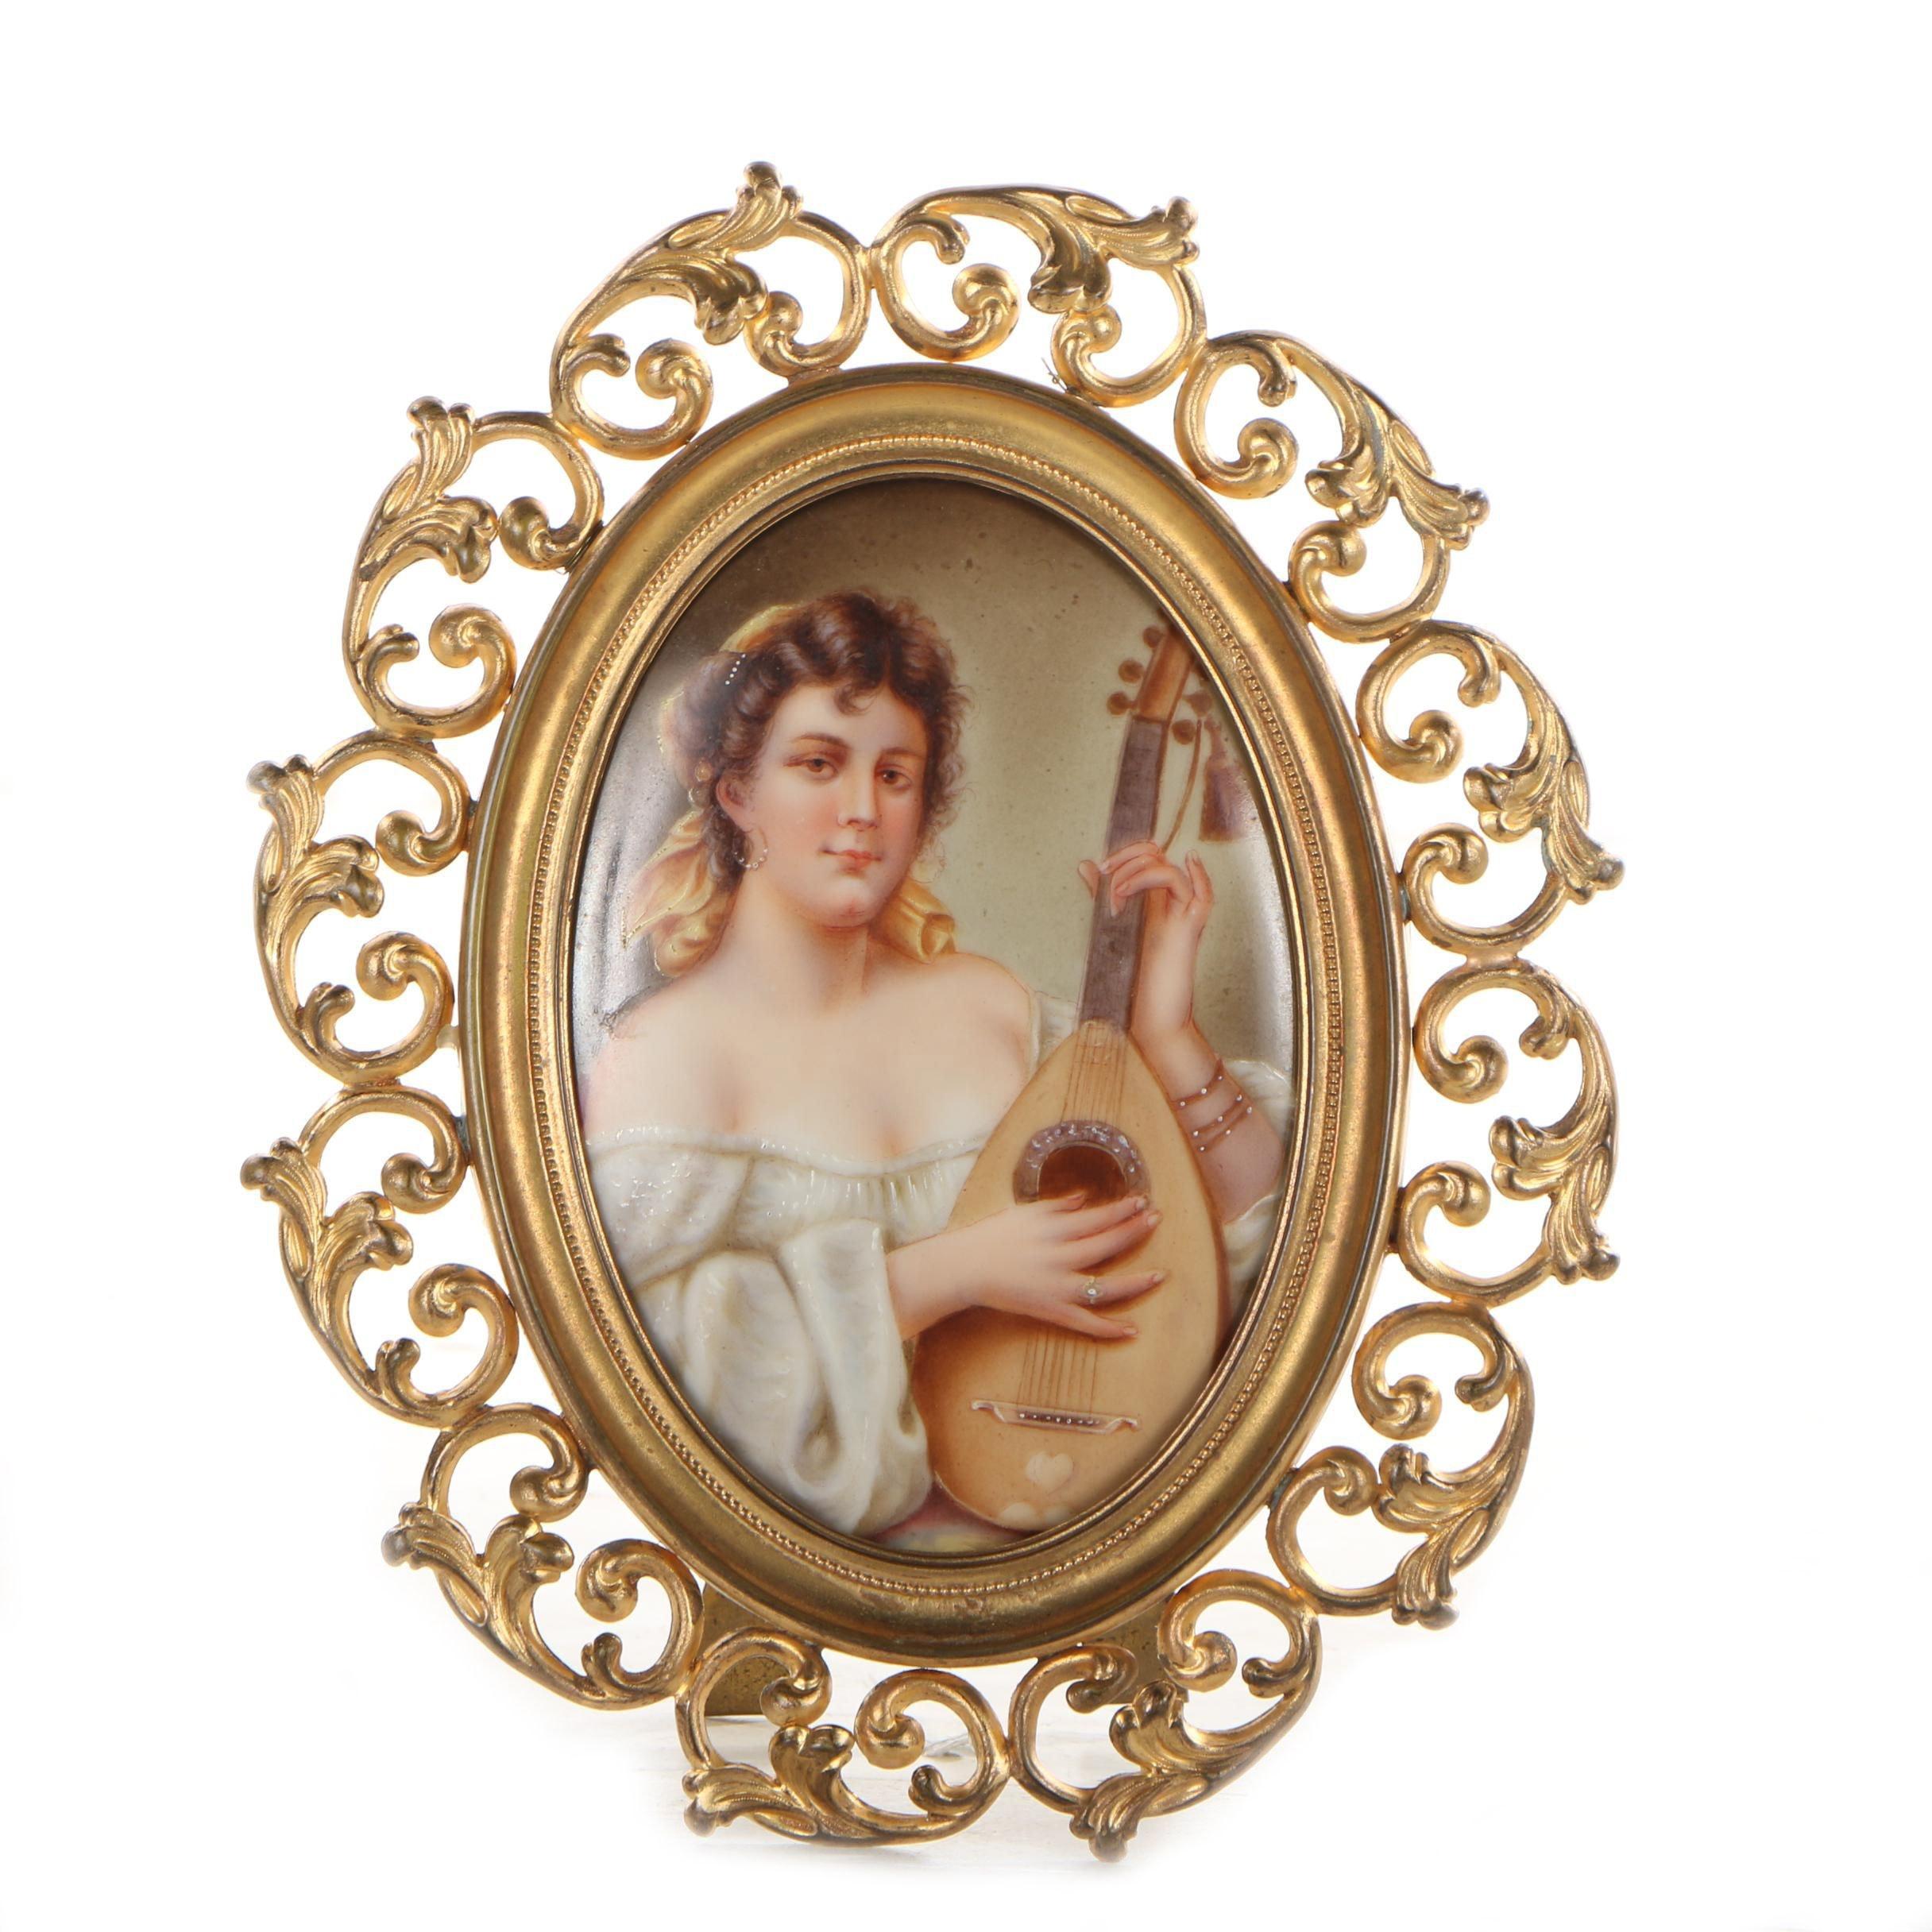 Miniature Painting on Porcelain